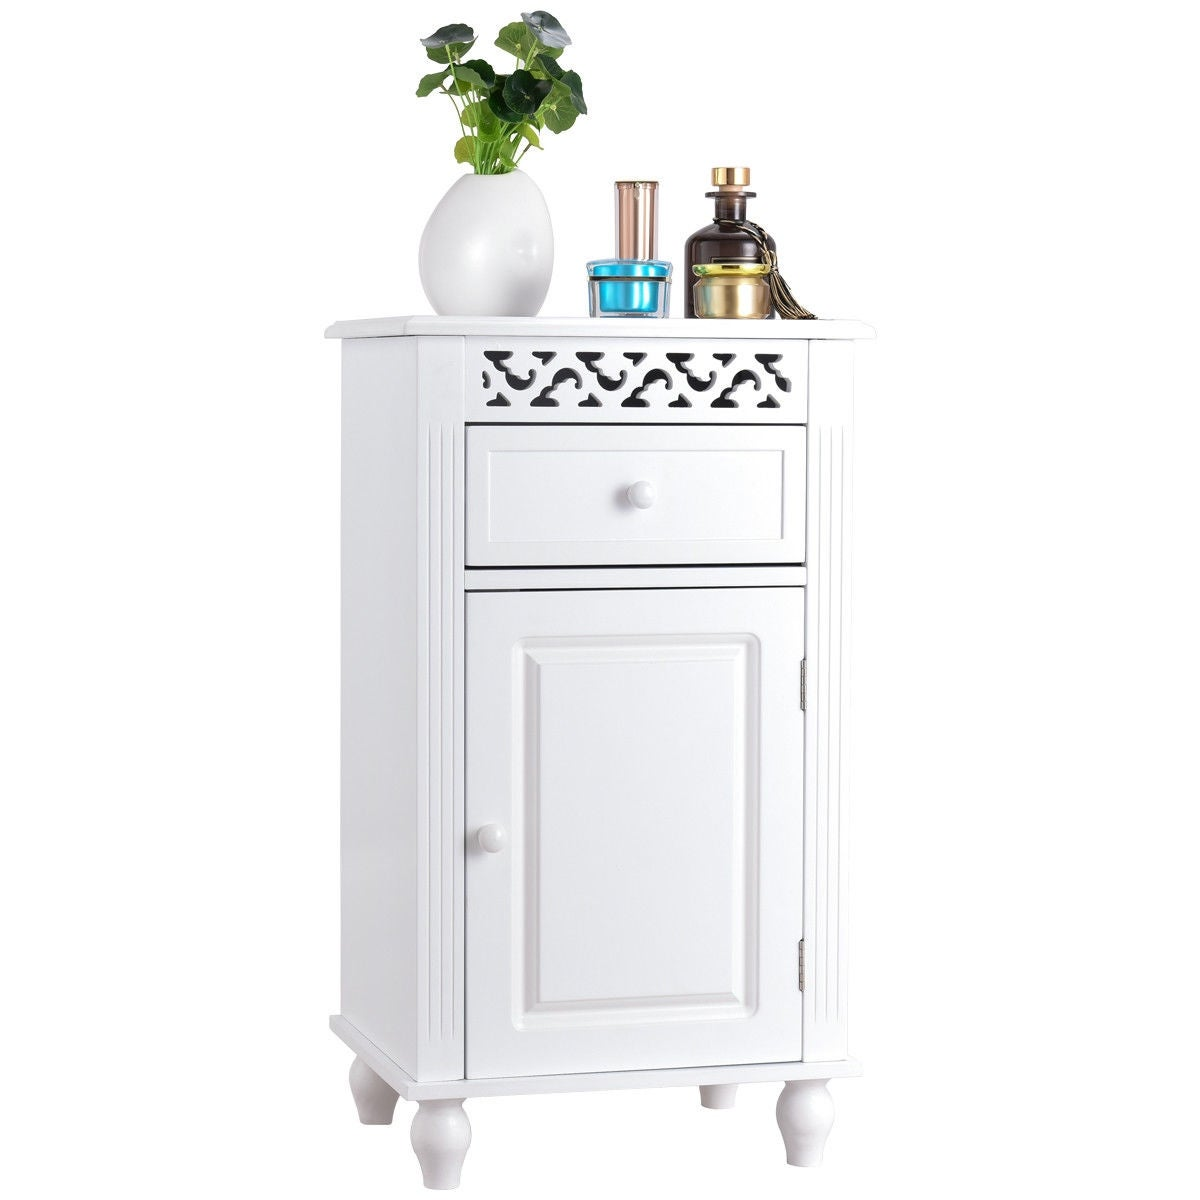 Bathroom Cabinets Storage Online At Our Best Furniture Deals